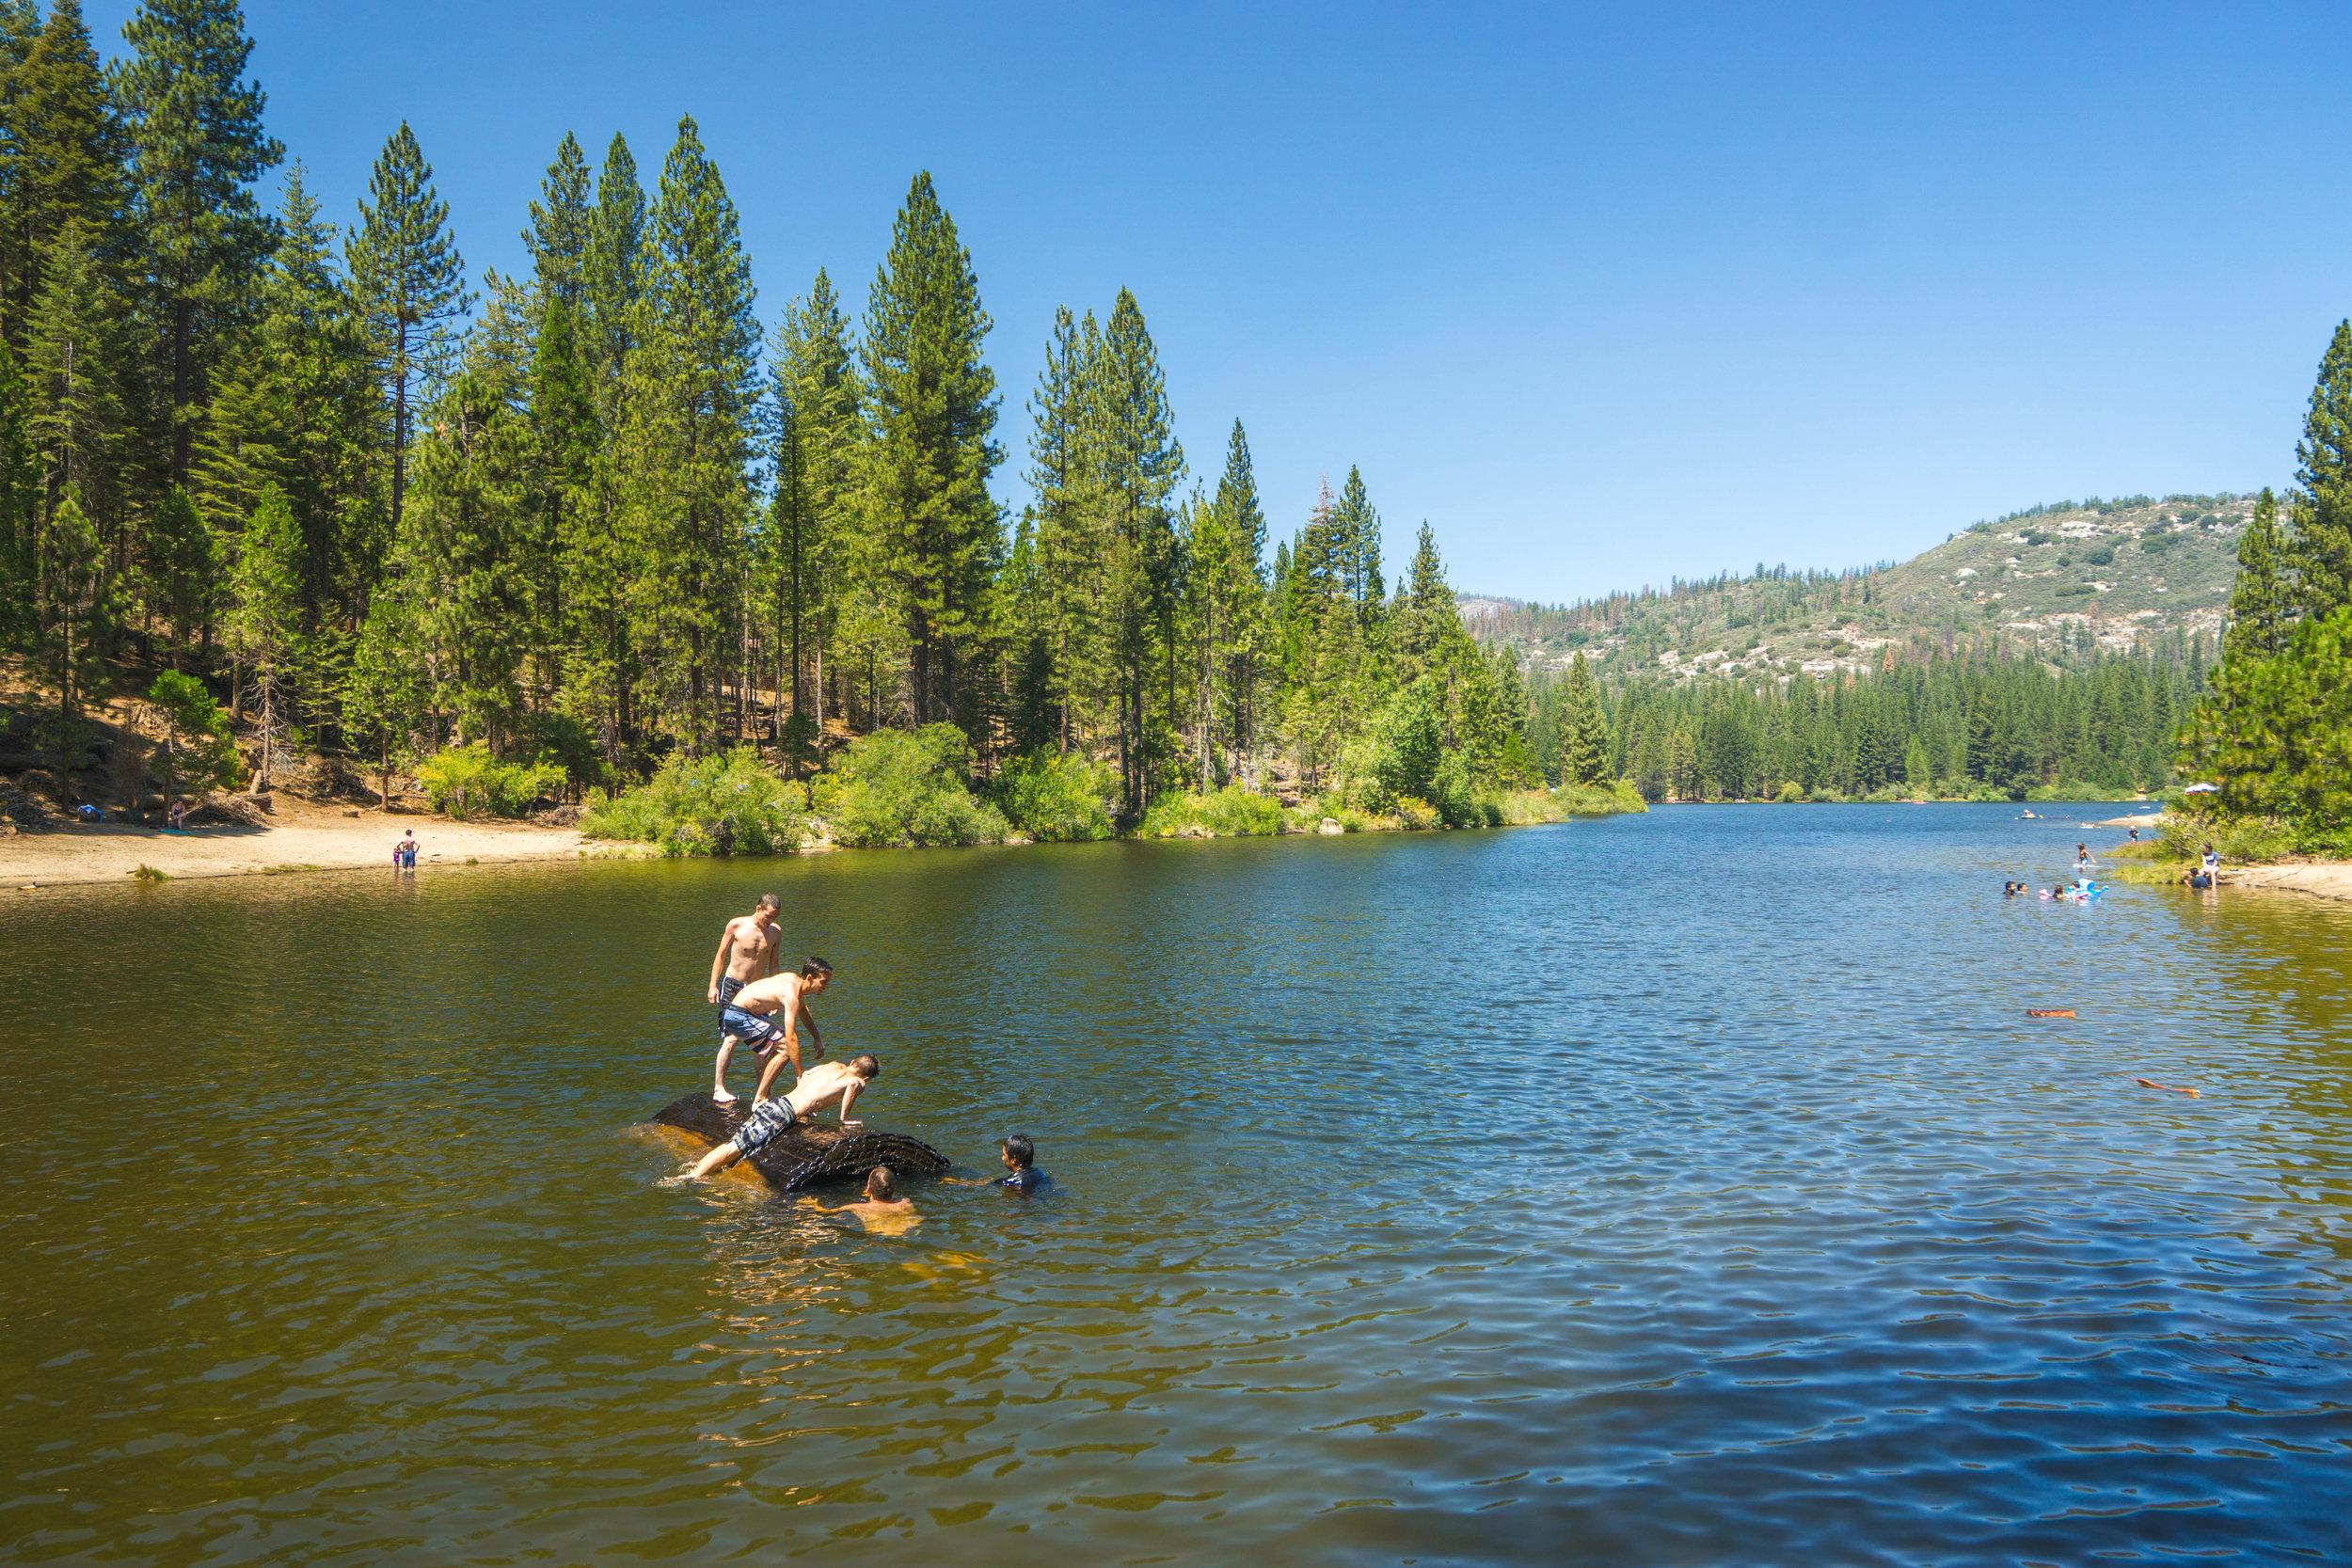 Downstream we venture to the lake & clamor onto a massive Giant Sequoia log!